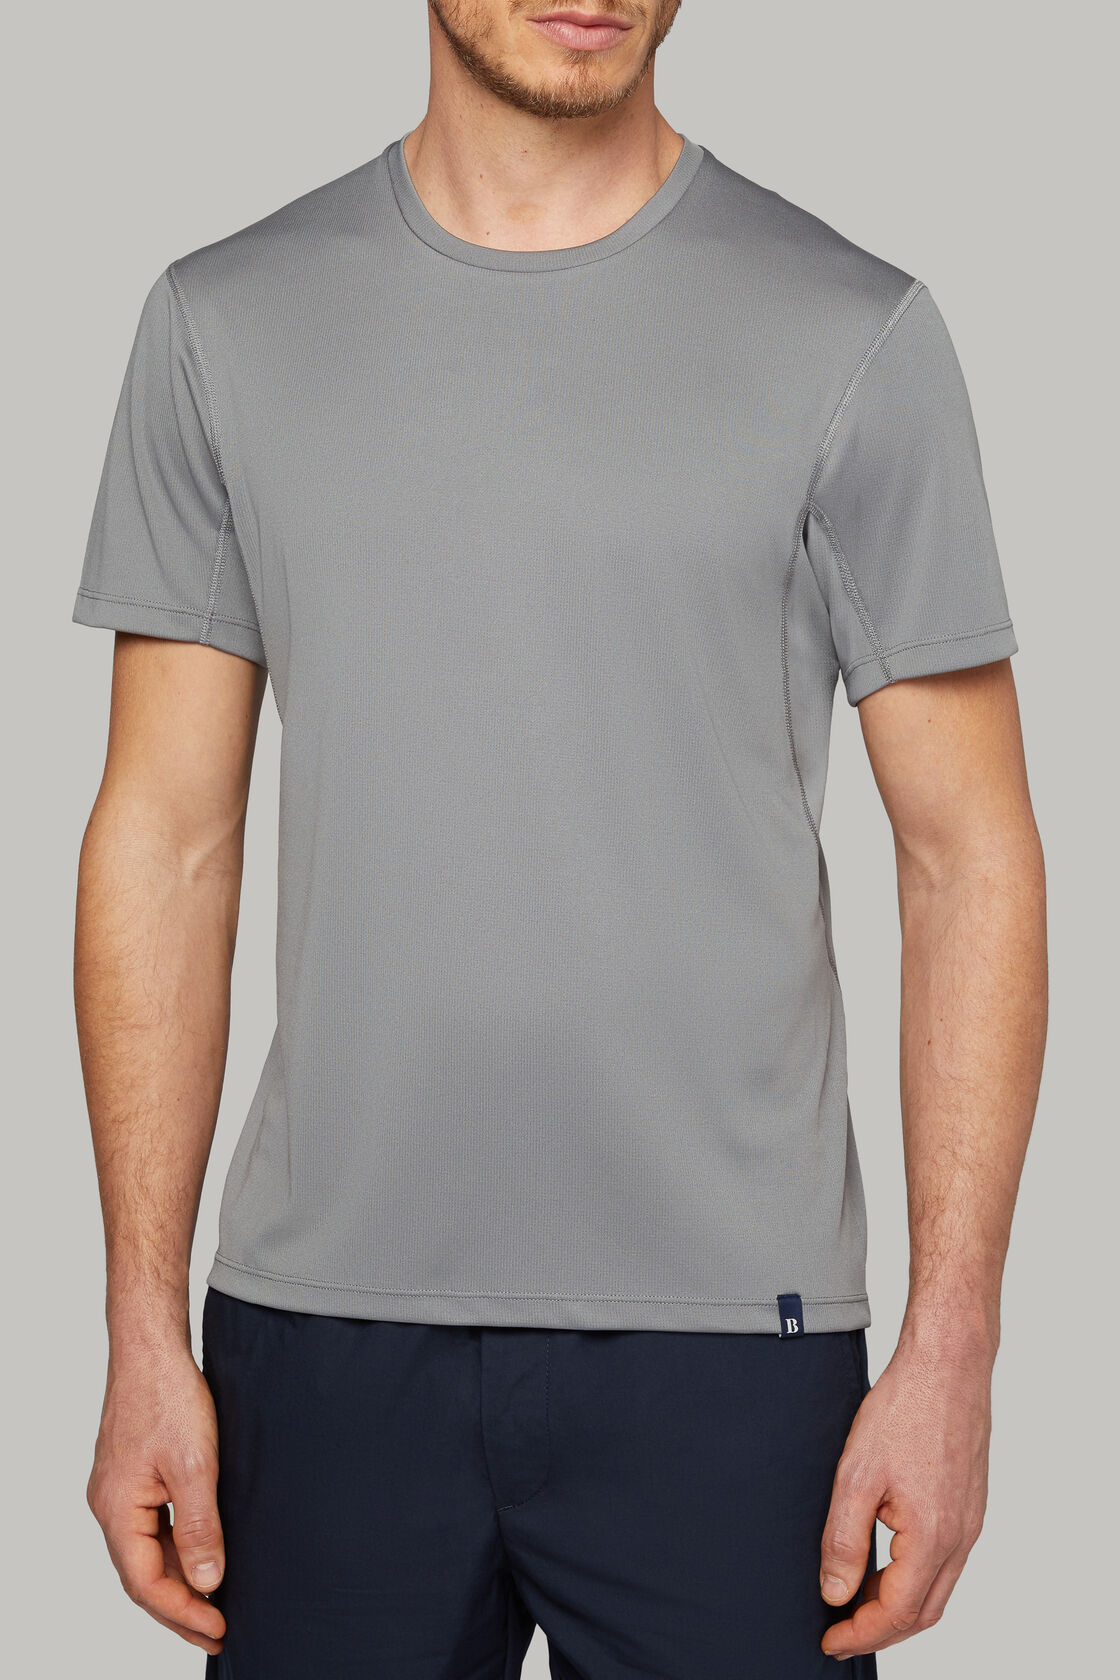 T-shirt in jersey tecnico performante, , hi-res